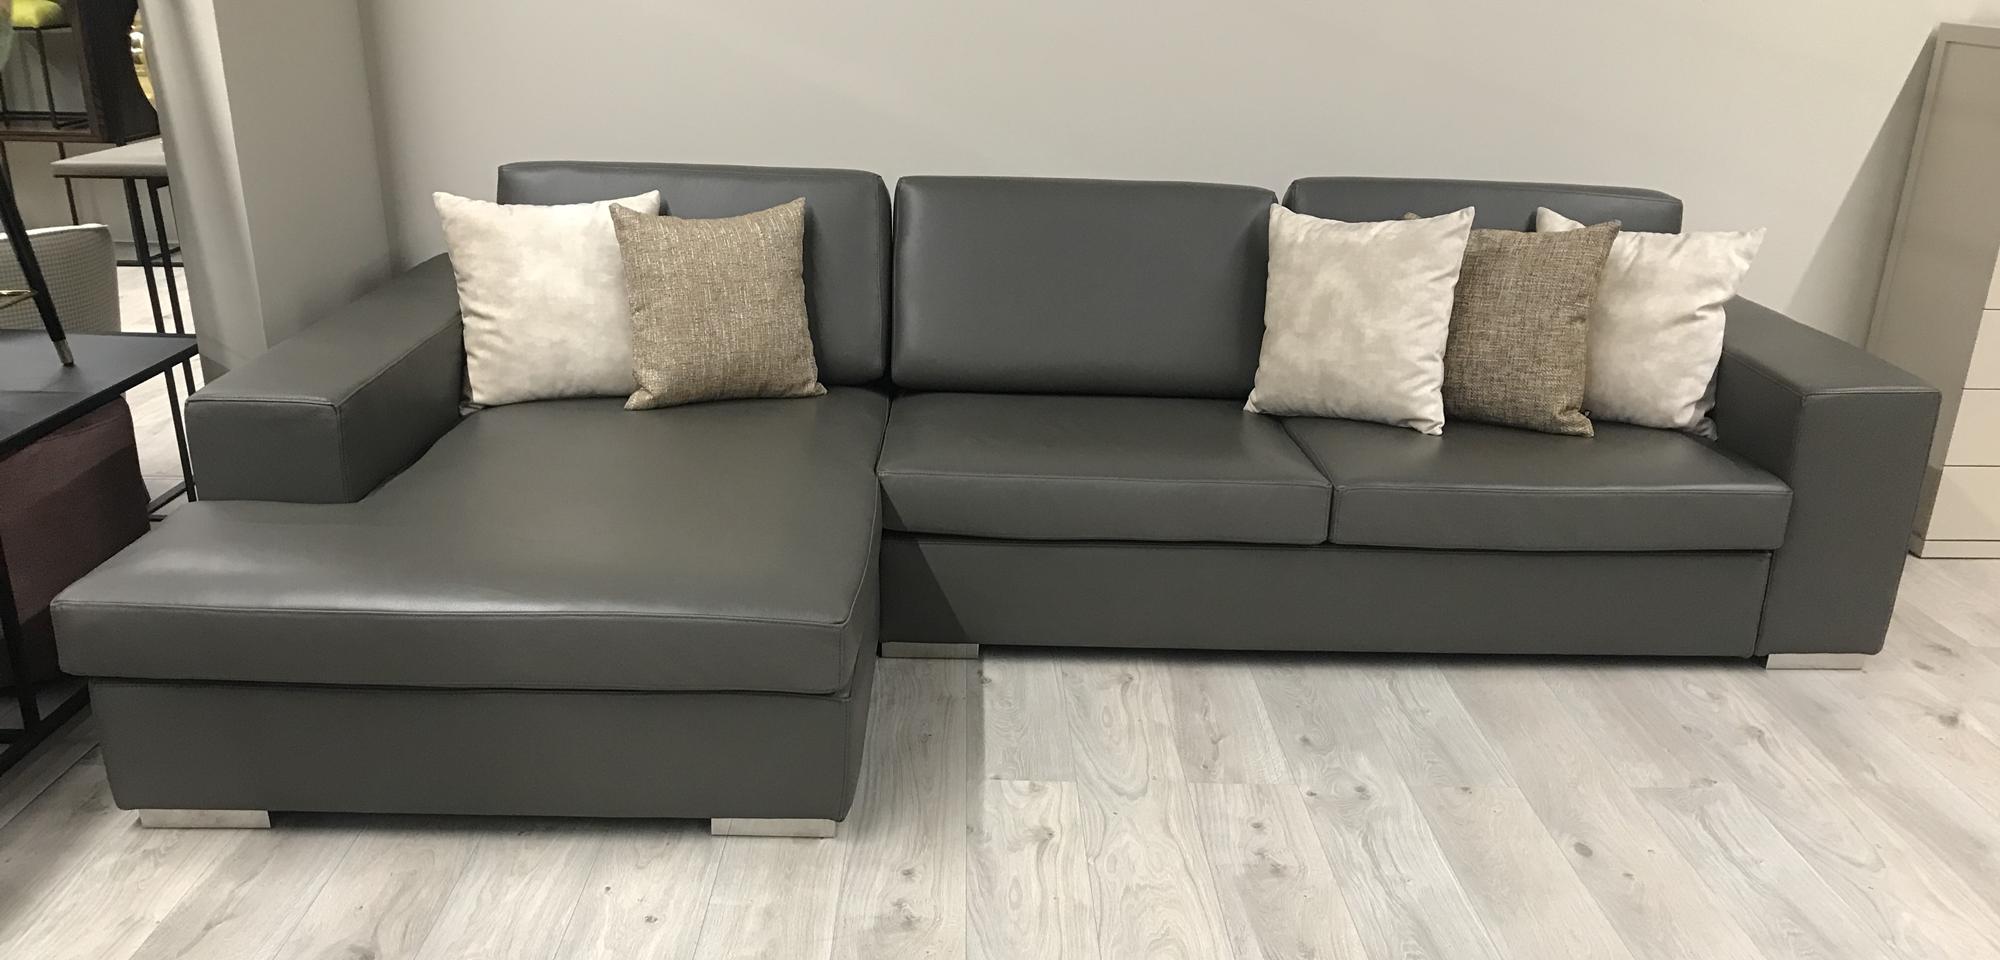 sofa-fen-chaise-longue-promoçoes-escaldantes-domkapa